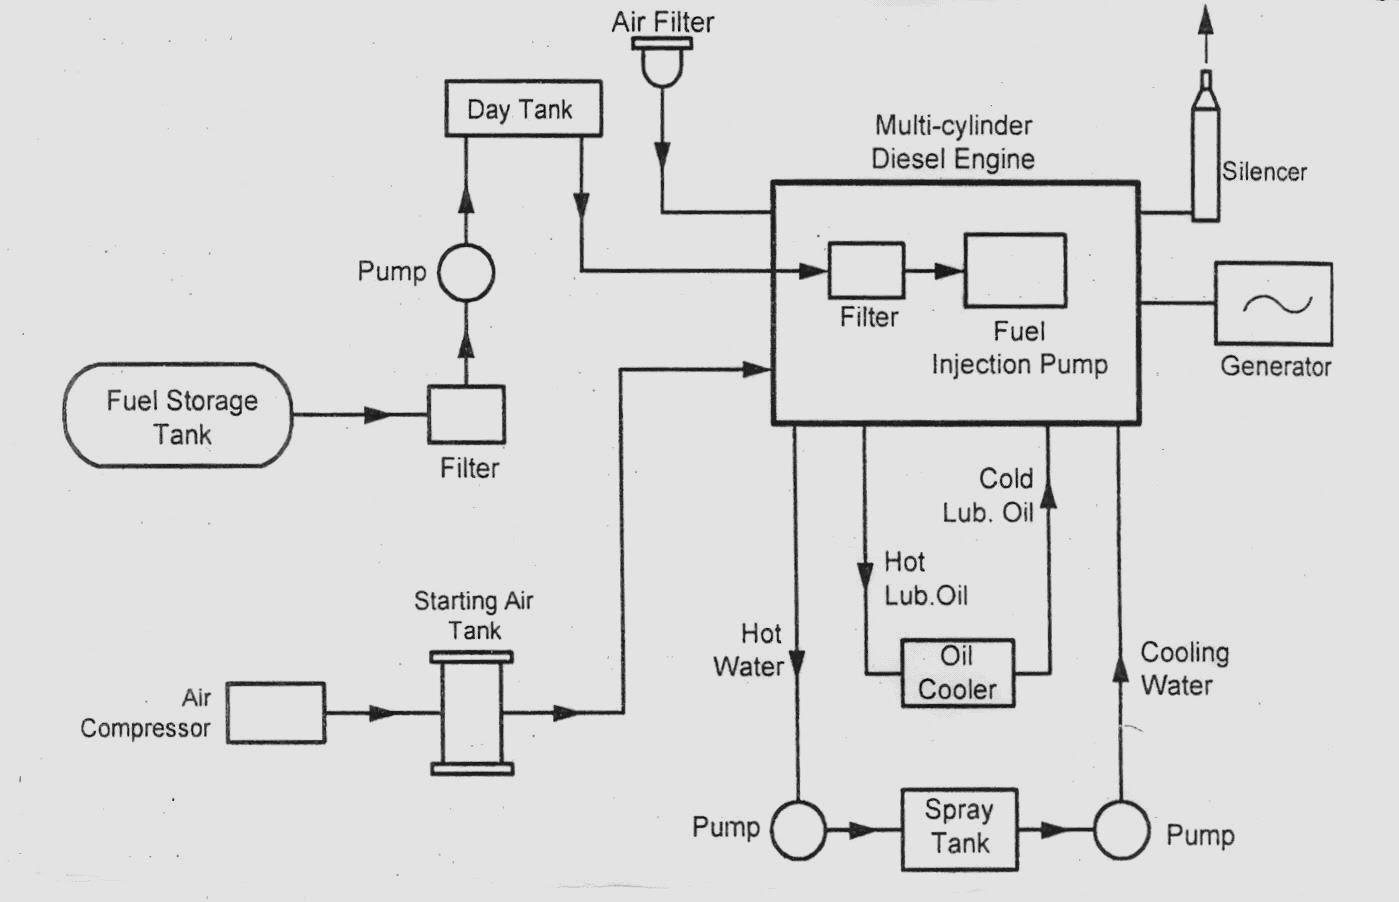 Strike Slip Fault Block Diagram Code Alarm Elite 4000 Wiring Nuclear Power Plant Simple Imageresizertool Com